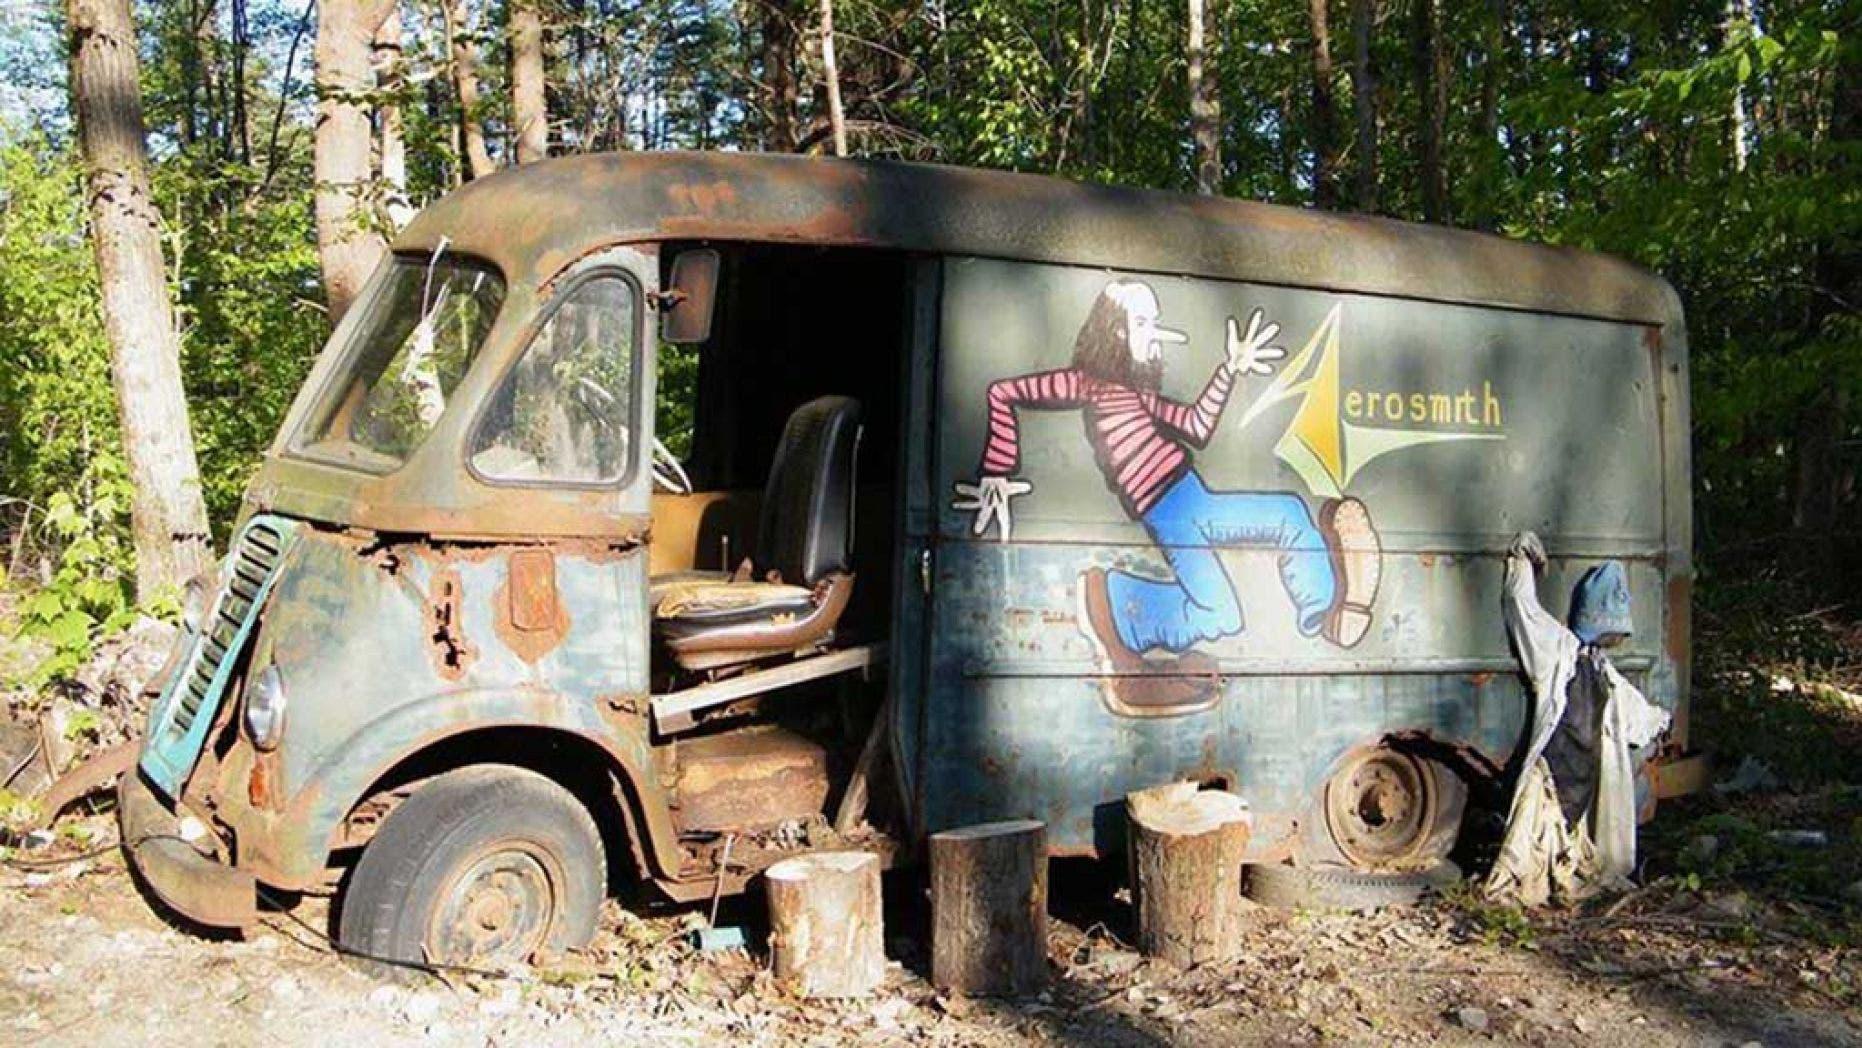 original Aerosmith tour van